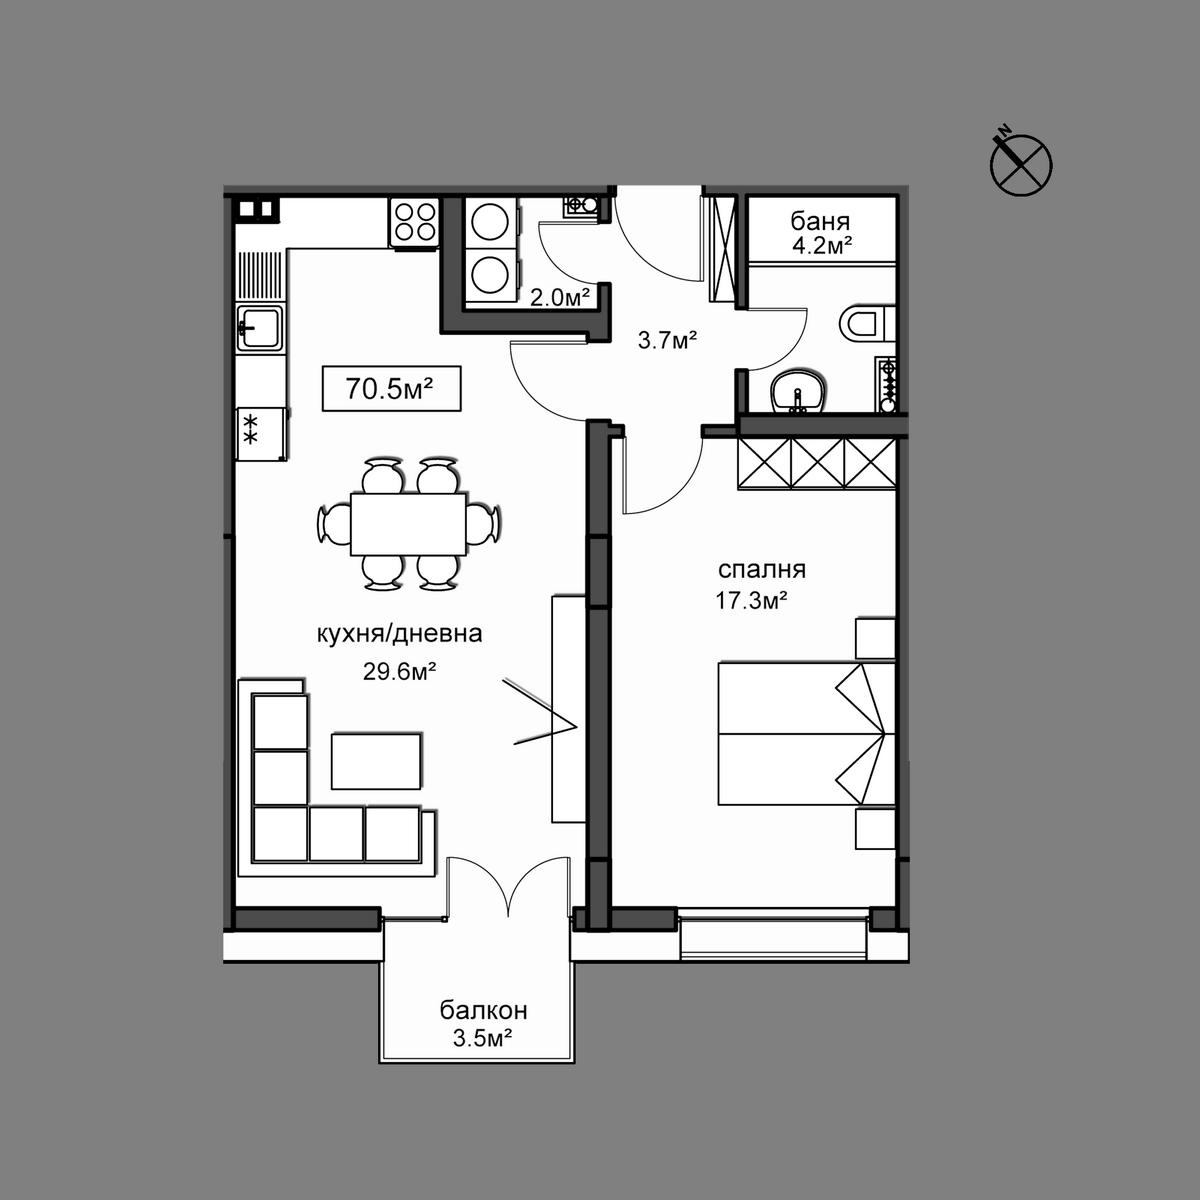 Продава апартамент ново строителство - Апартамент 6